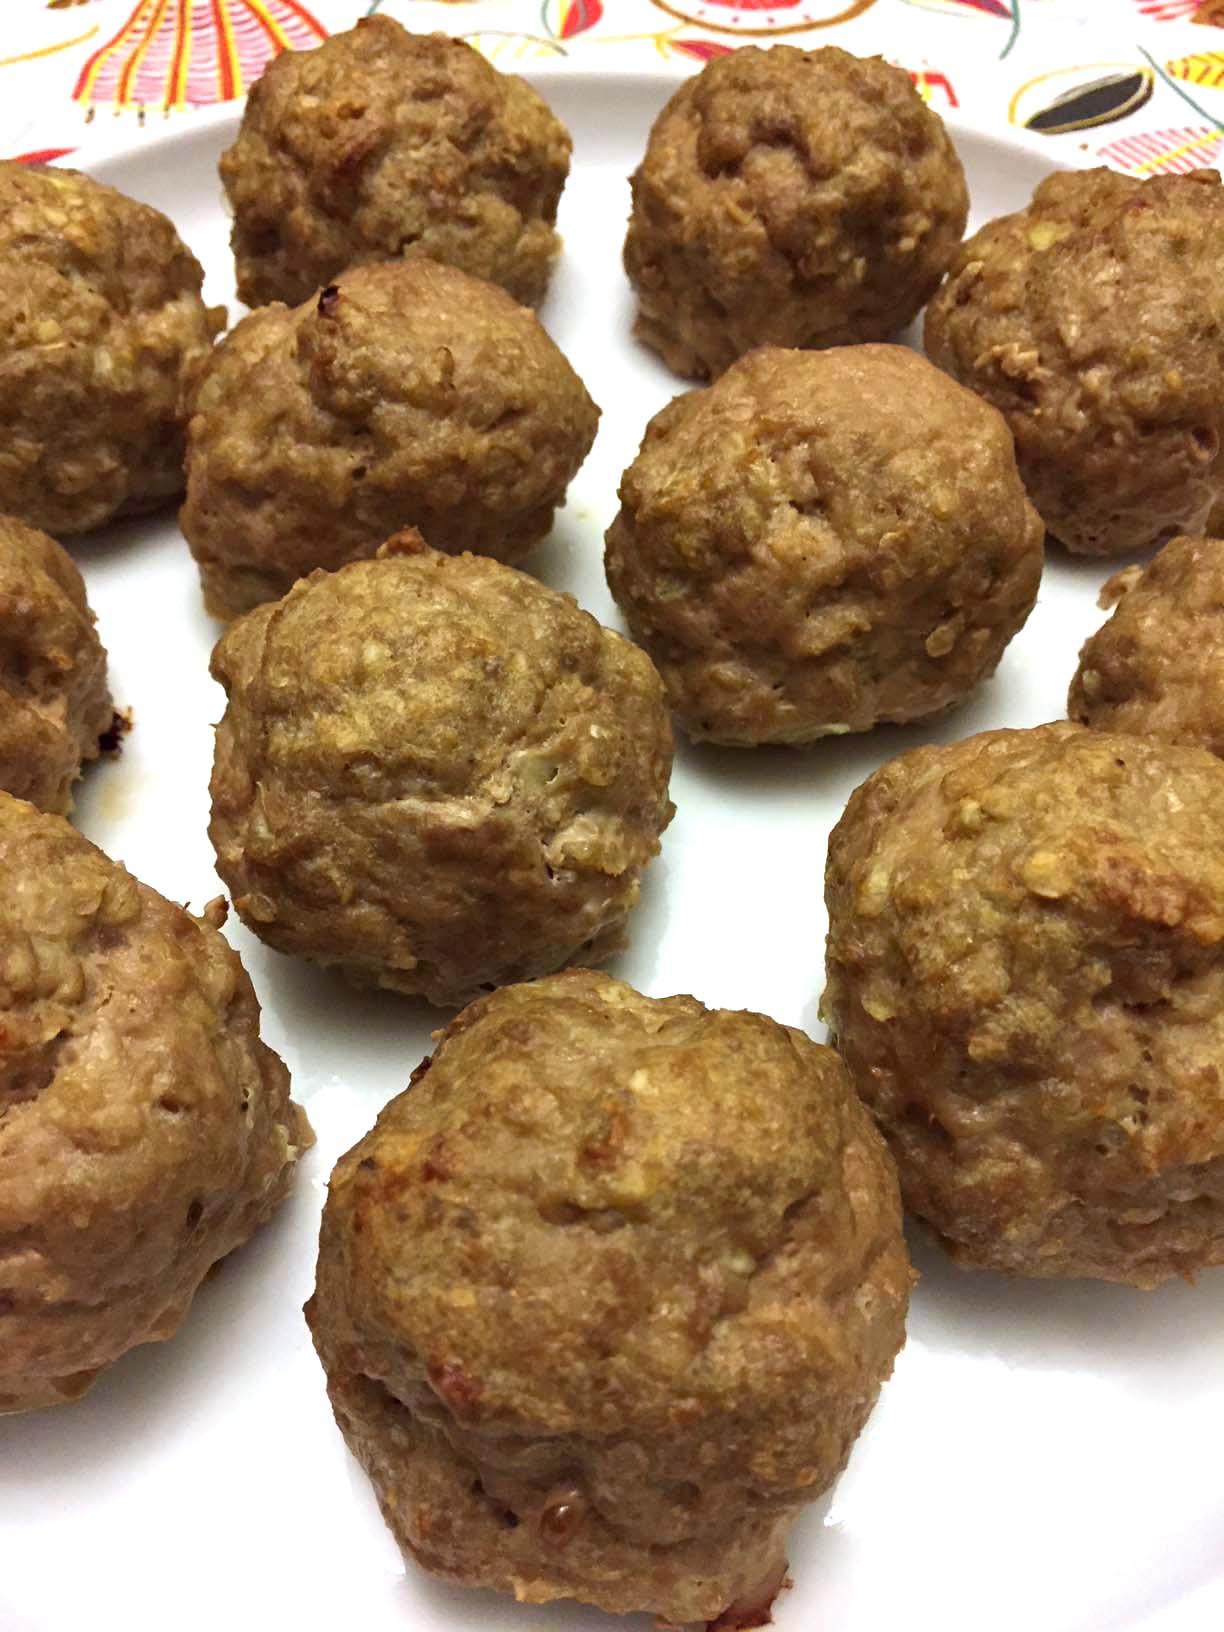 Baked Gluten Free Meatballs Recipe With Oatmeal Melanie